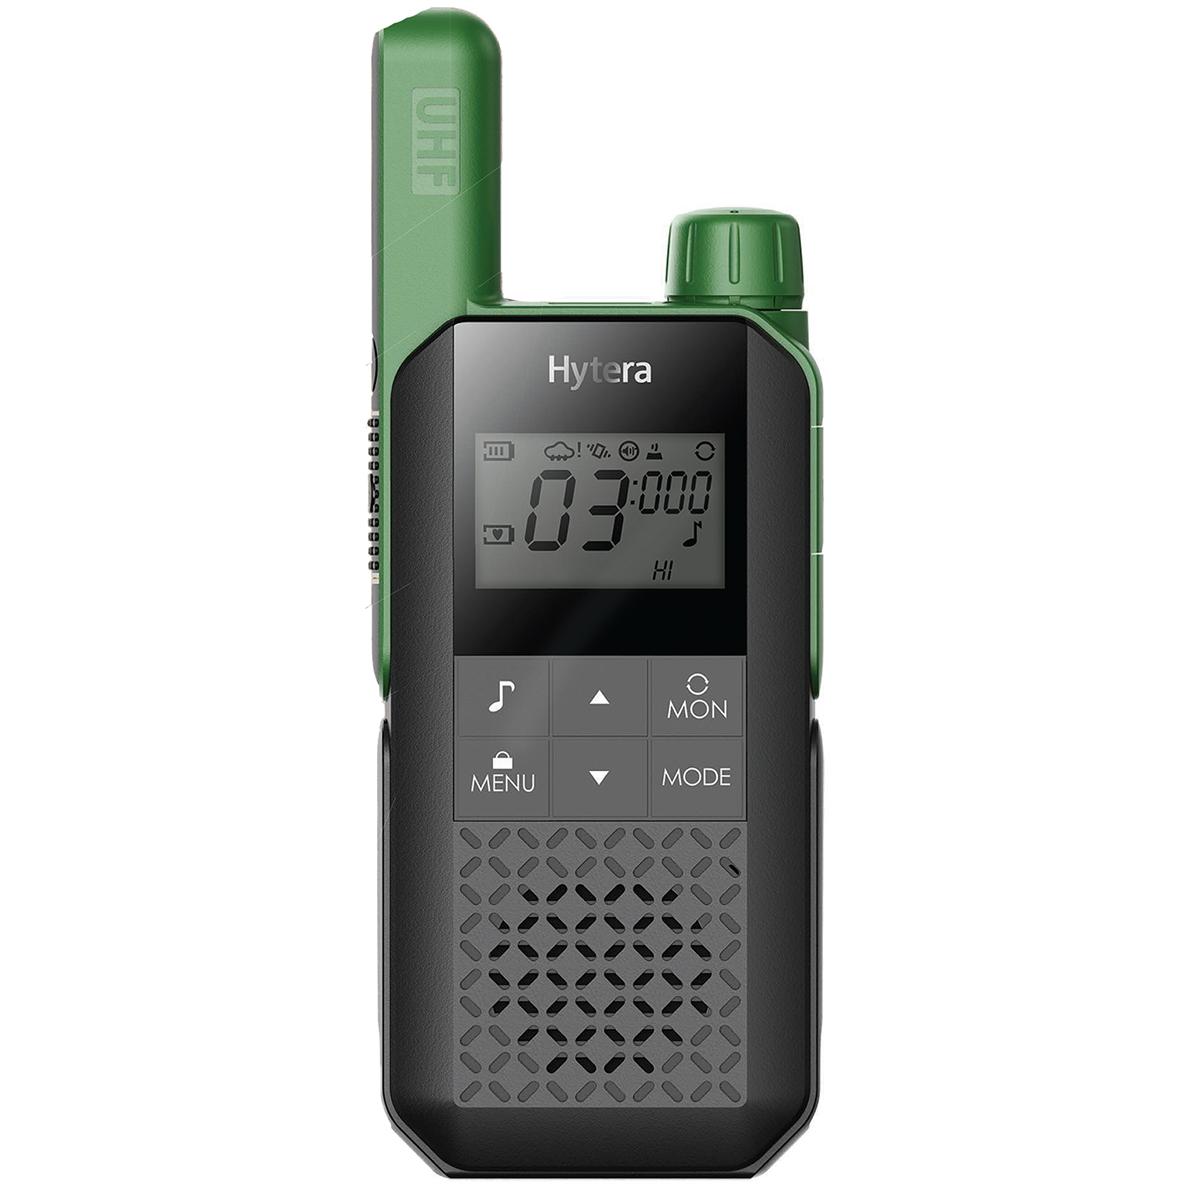 Hytera Push 2 Talk TF615 2 Way Radio Twin Pack